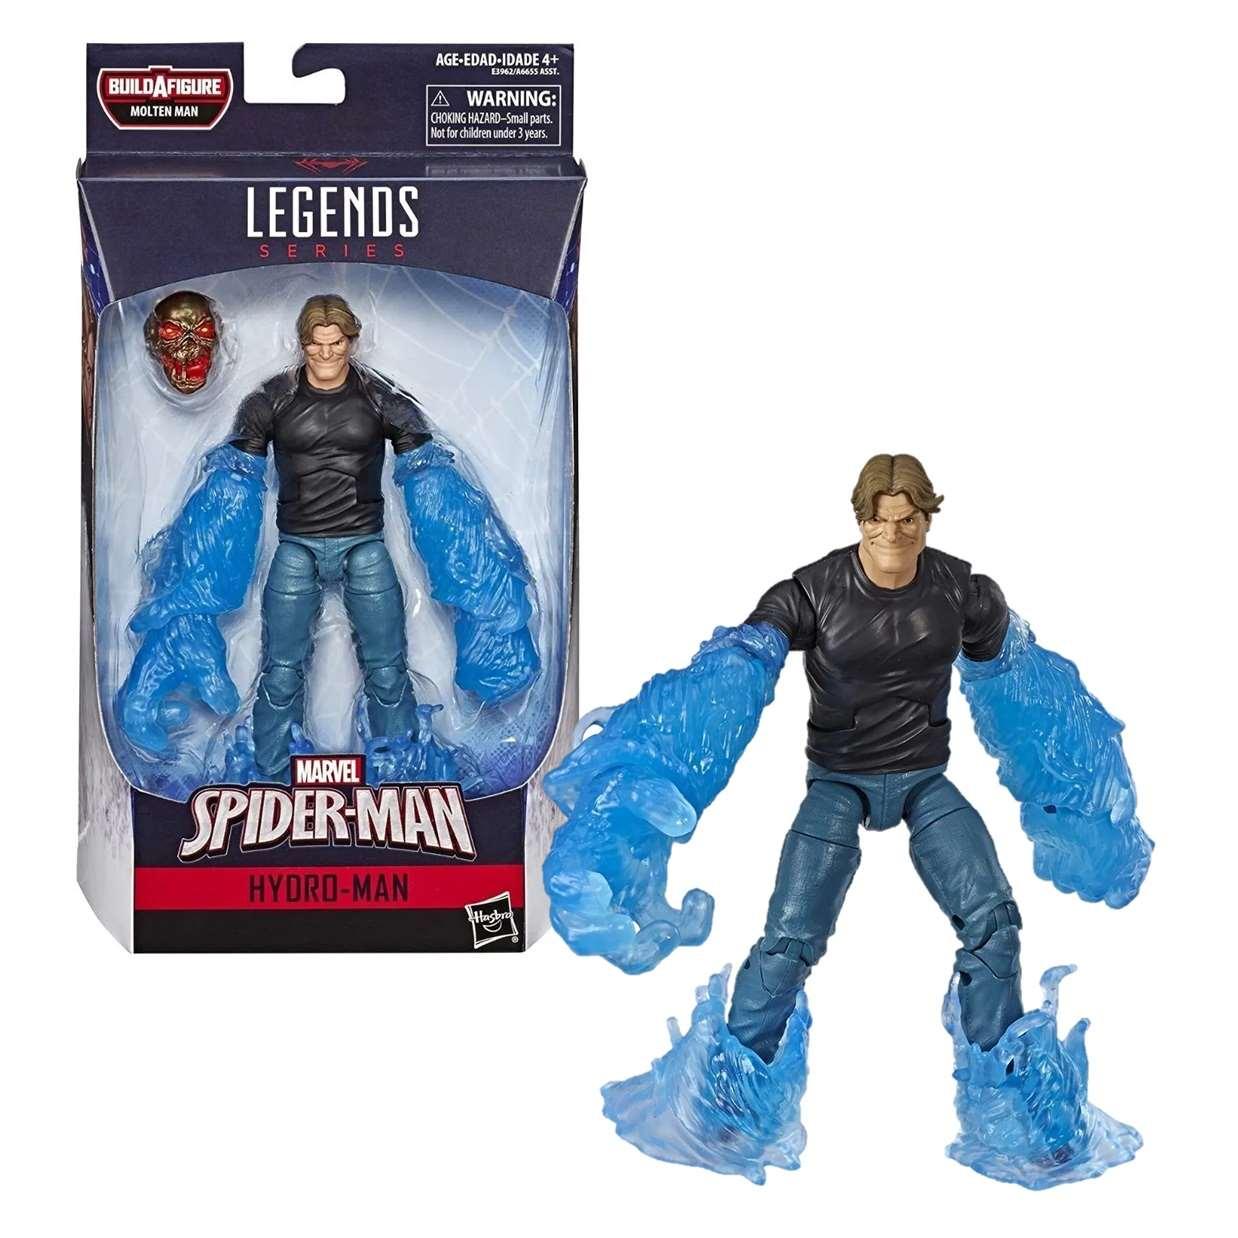 Hydro Man Figura Far From Home B A F Molten Man Legends